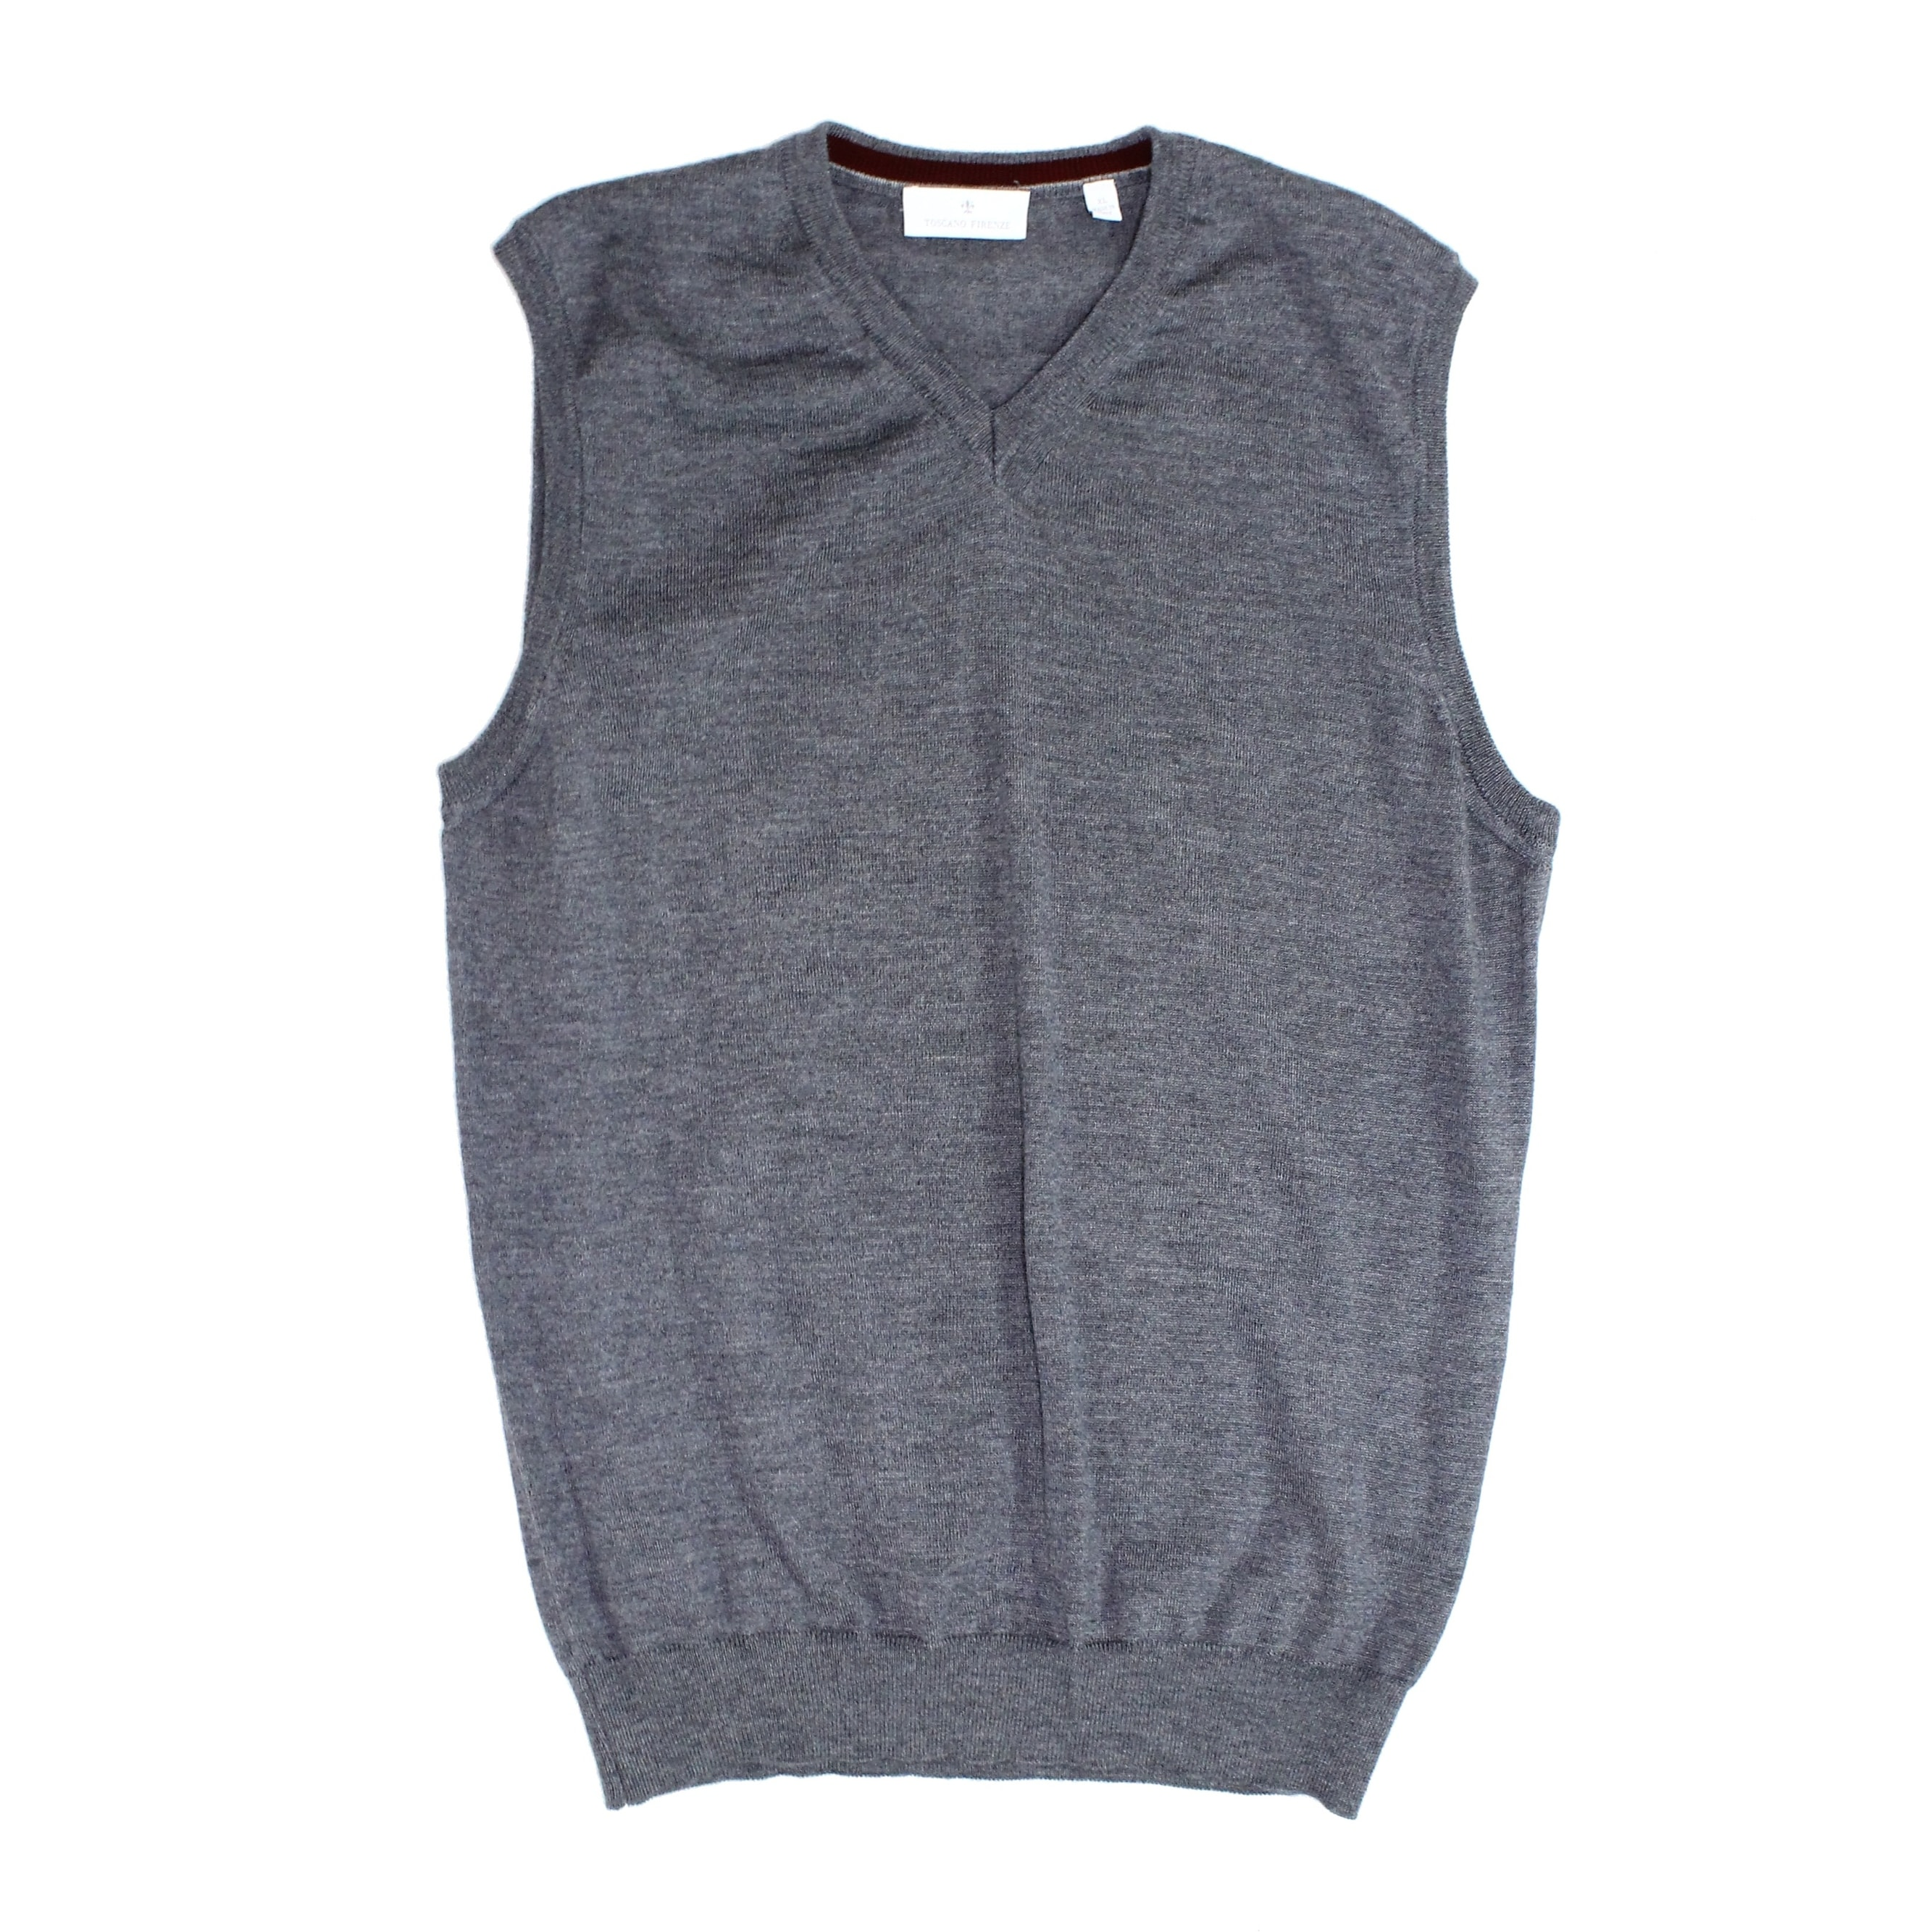 Toscano Firenze Mens Sweater Heather Gray Size XL Rib Knit Vest Wool